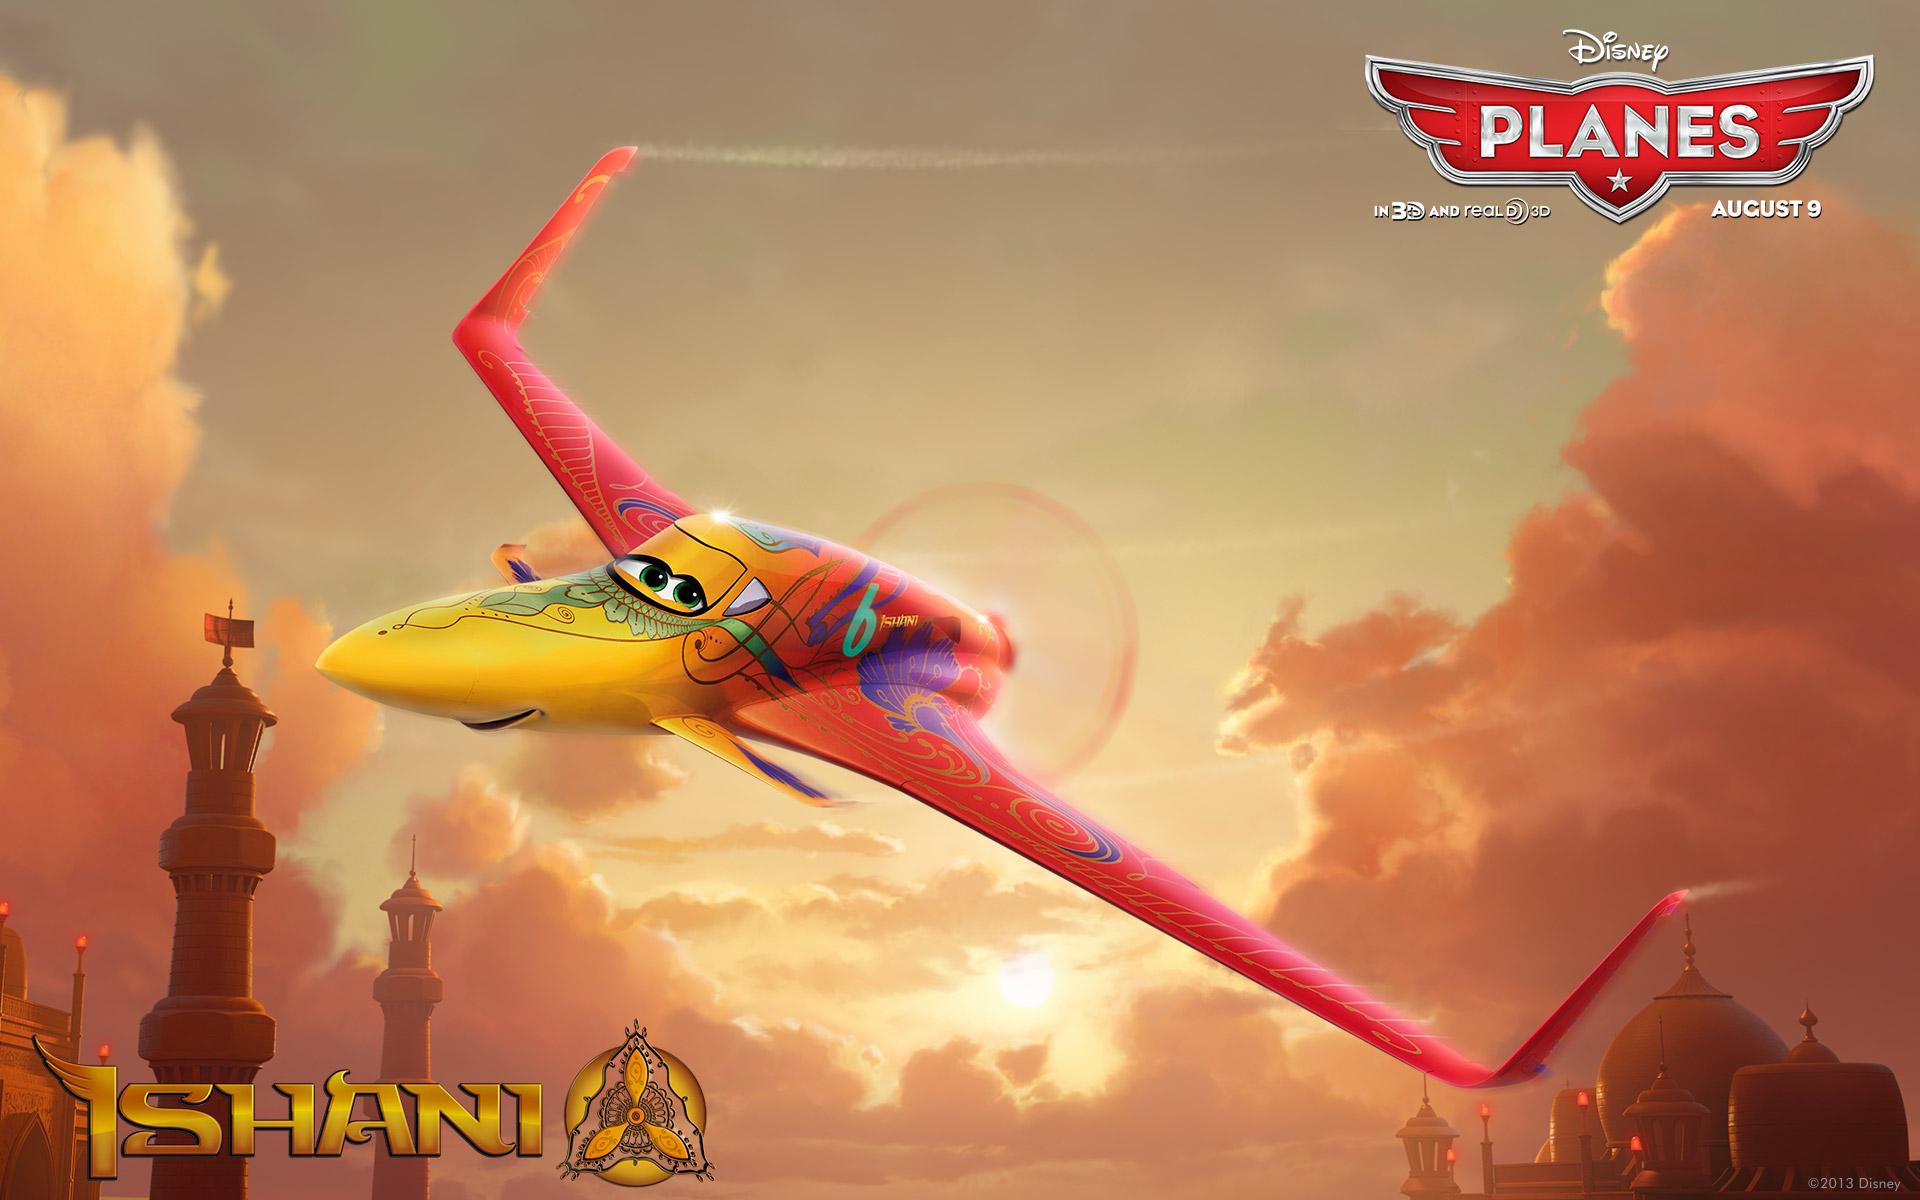 disney planes 2013 movie wallpapers facebook cover photos